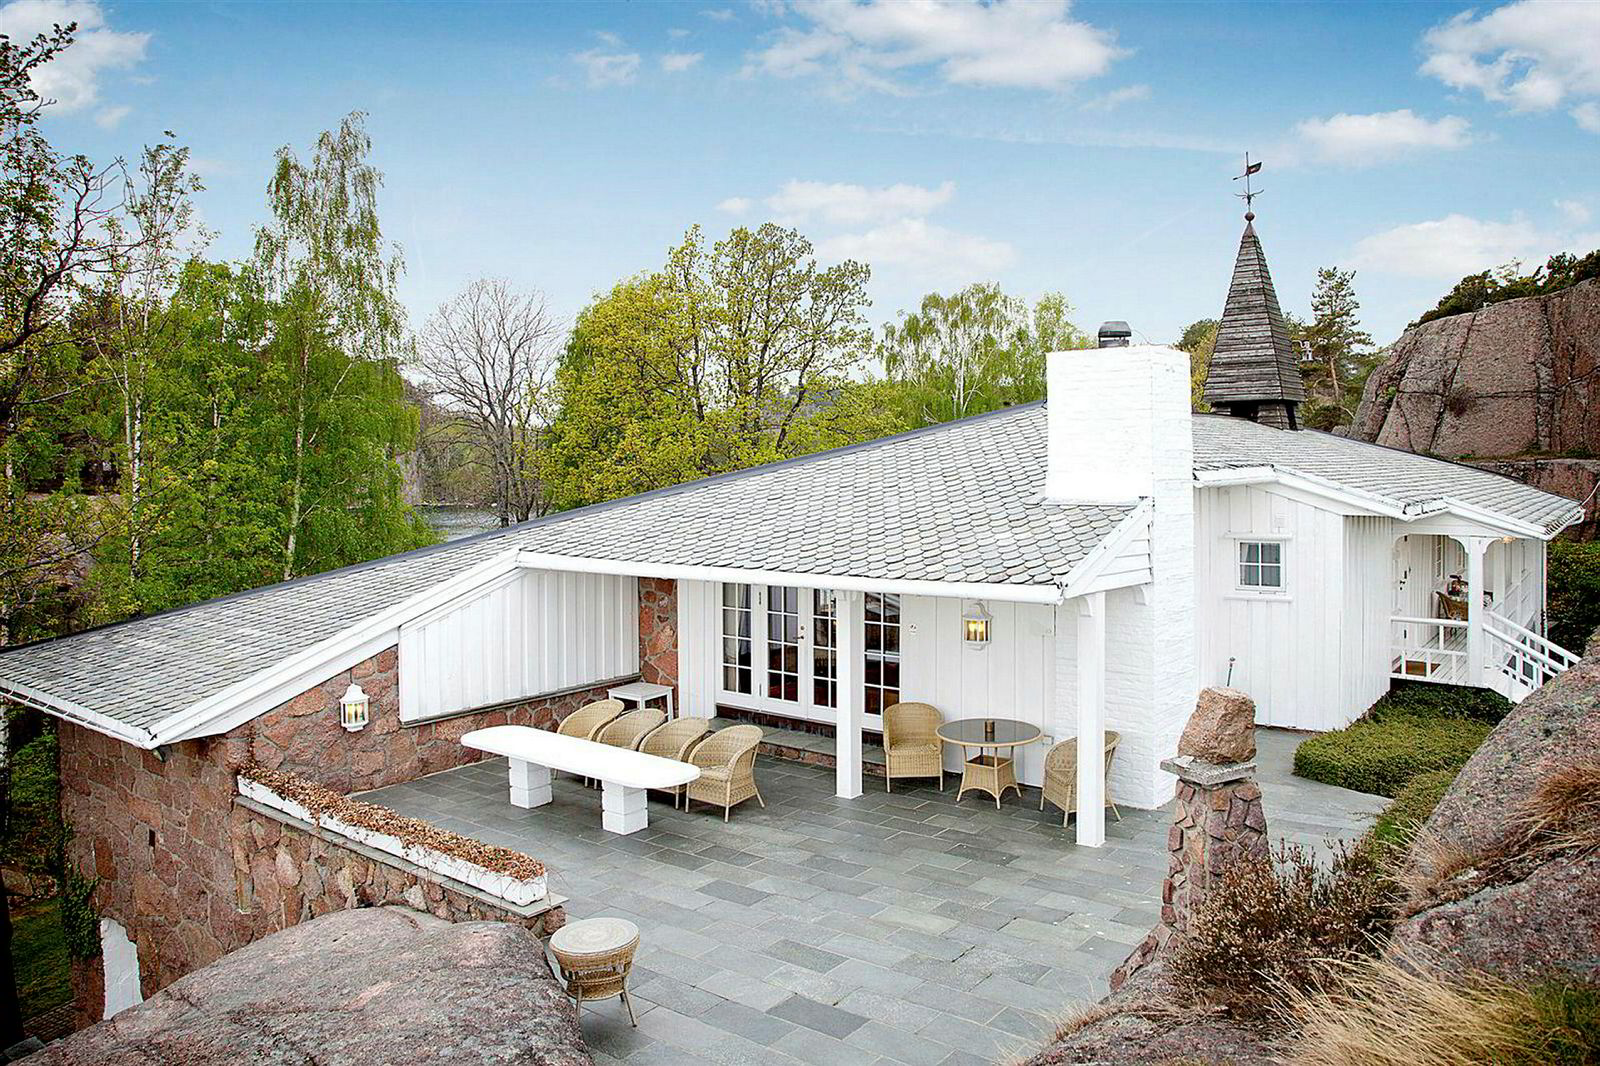 I 2011 kjøpte krafttrader Einar Aas landstedet «Slottet» i Grimstad kommune. Det ble bygget av operasangeren Fanny Elstad på 50-tallet.